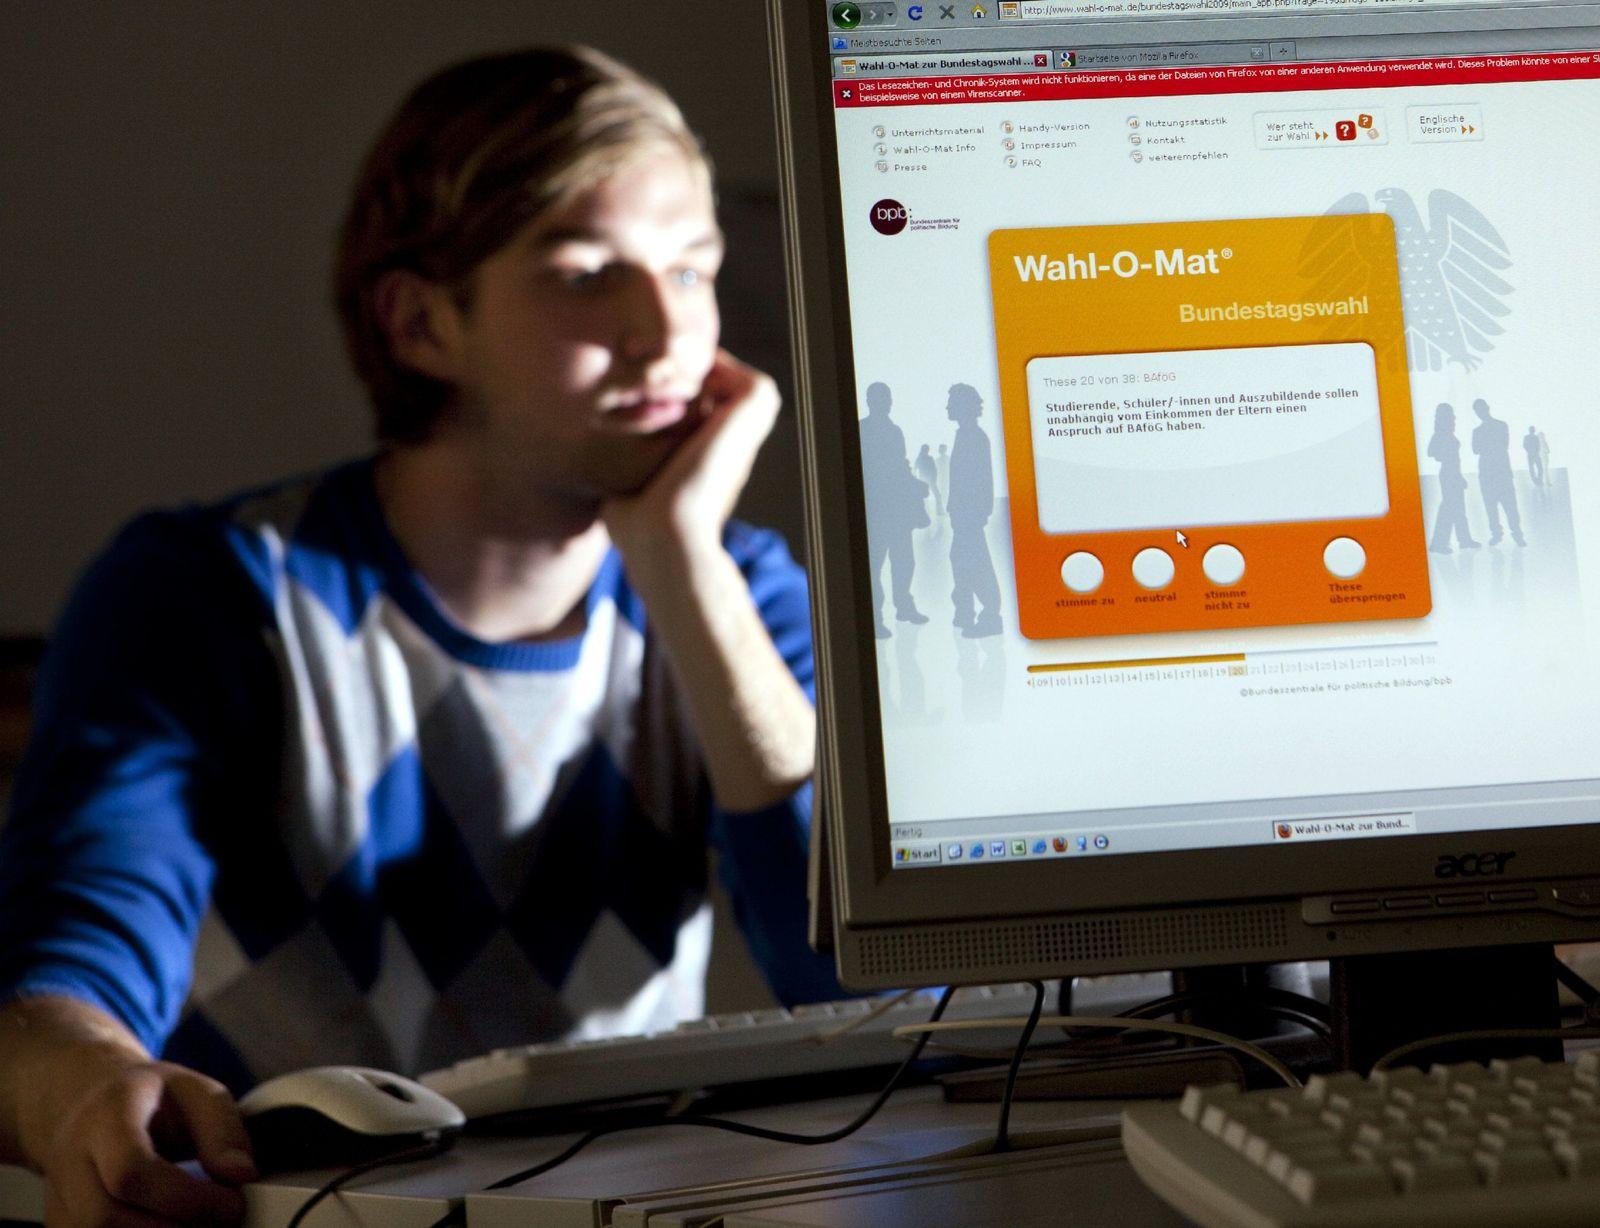 Wahl-O-Mat Schüler Jugendliche Bundestagswahl